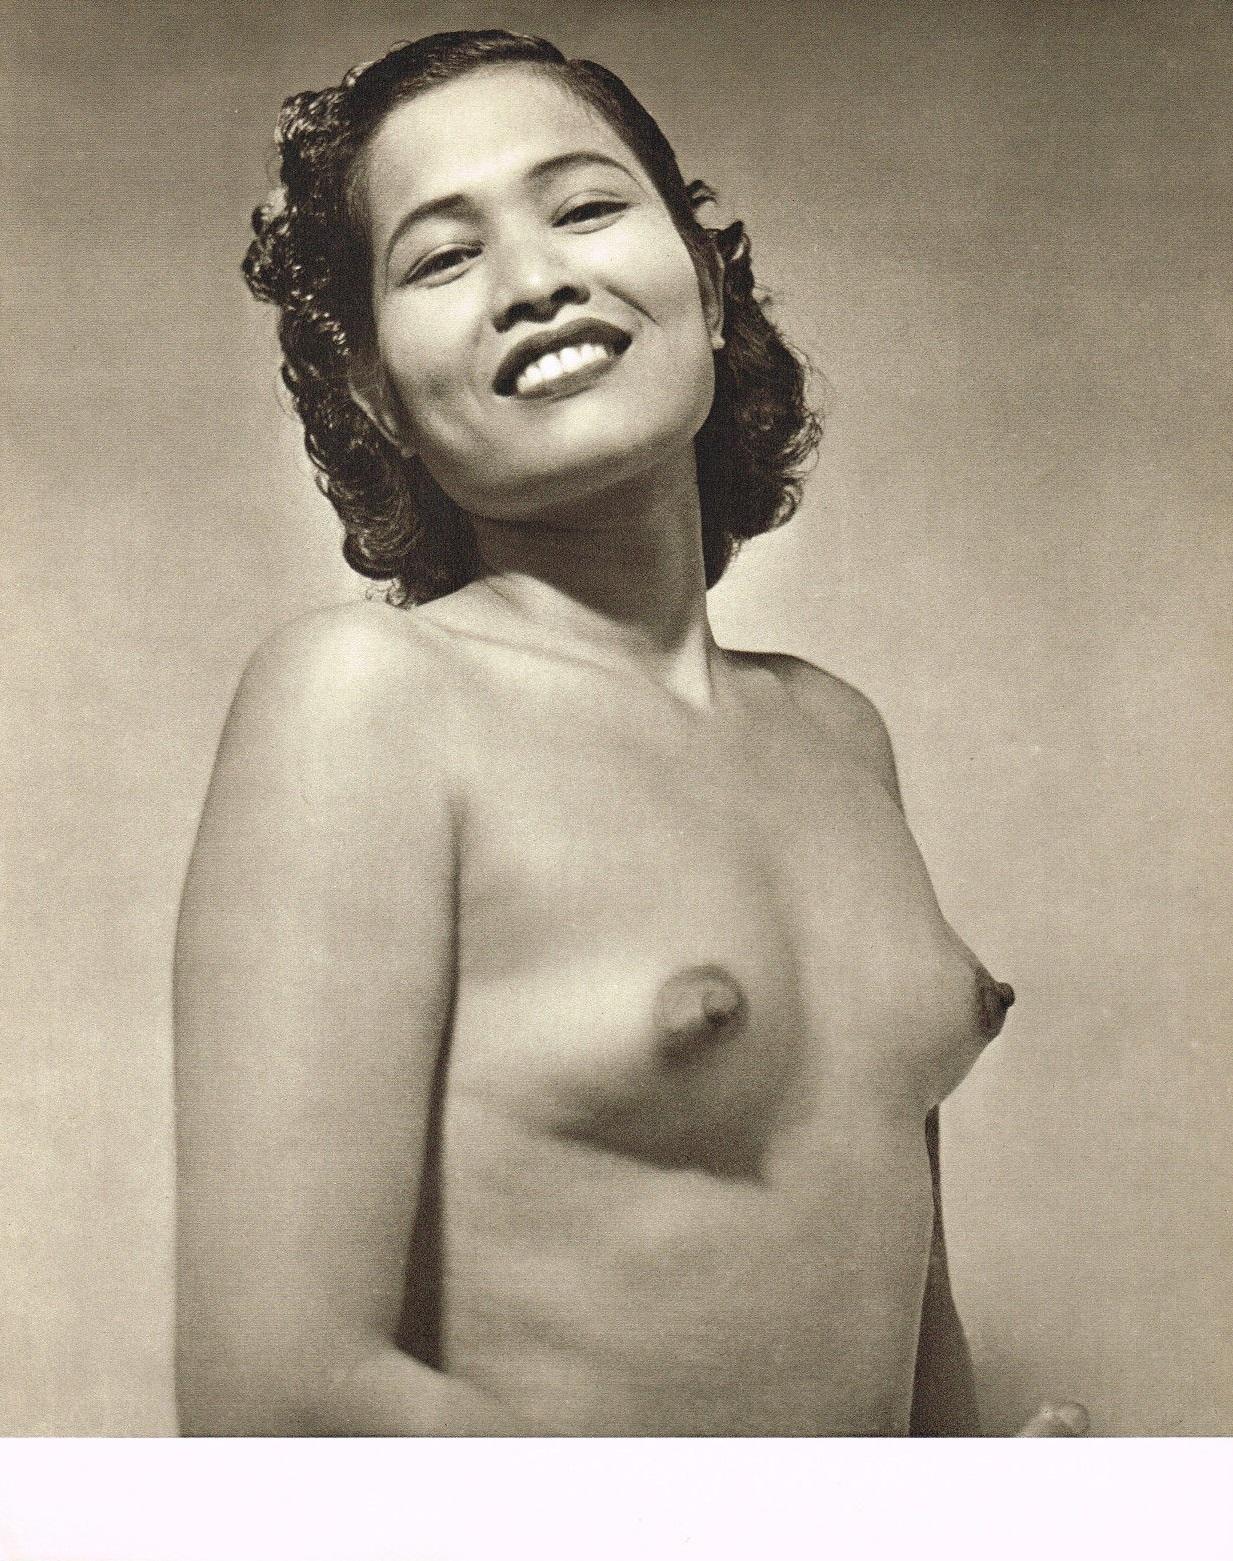 John Everard- Asian Female semi Nude photogravure 1950Oriental Model Published by Robert Hale Ltd., London in 1955. 4